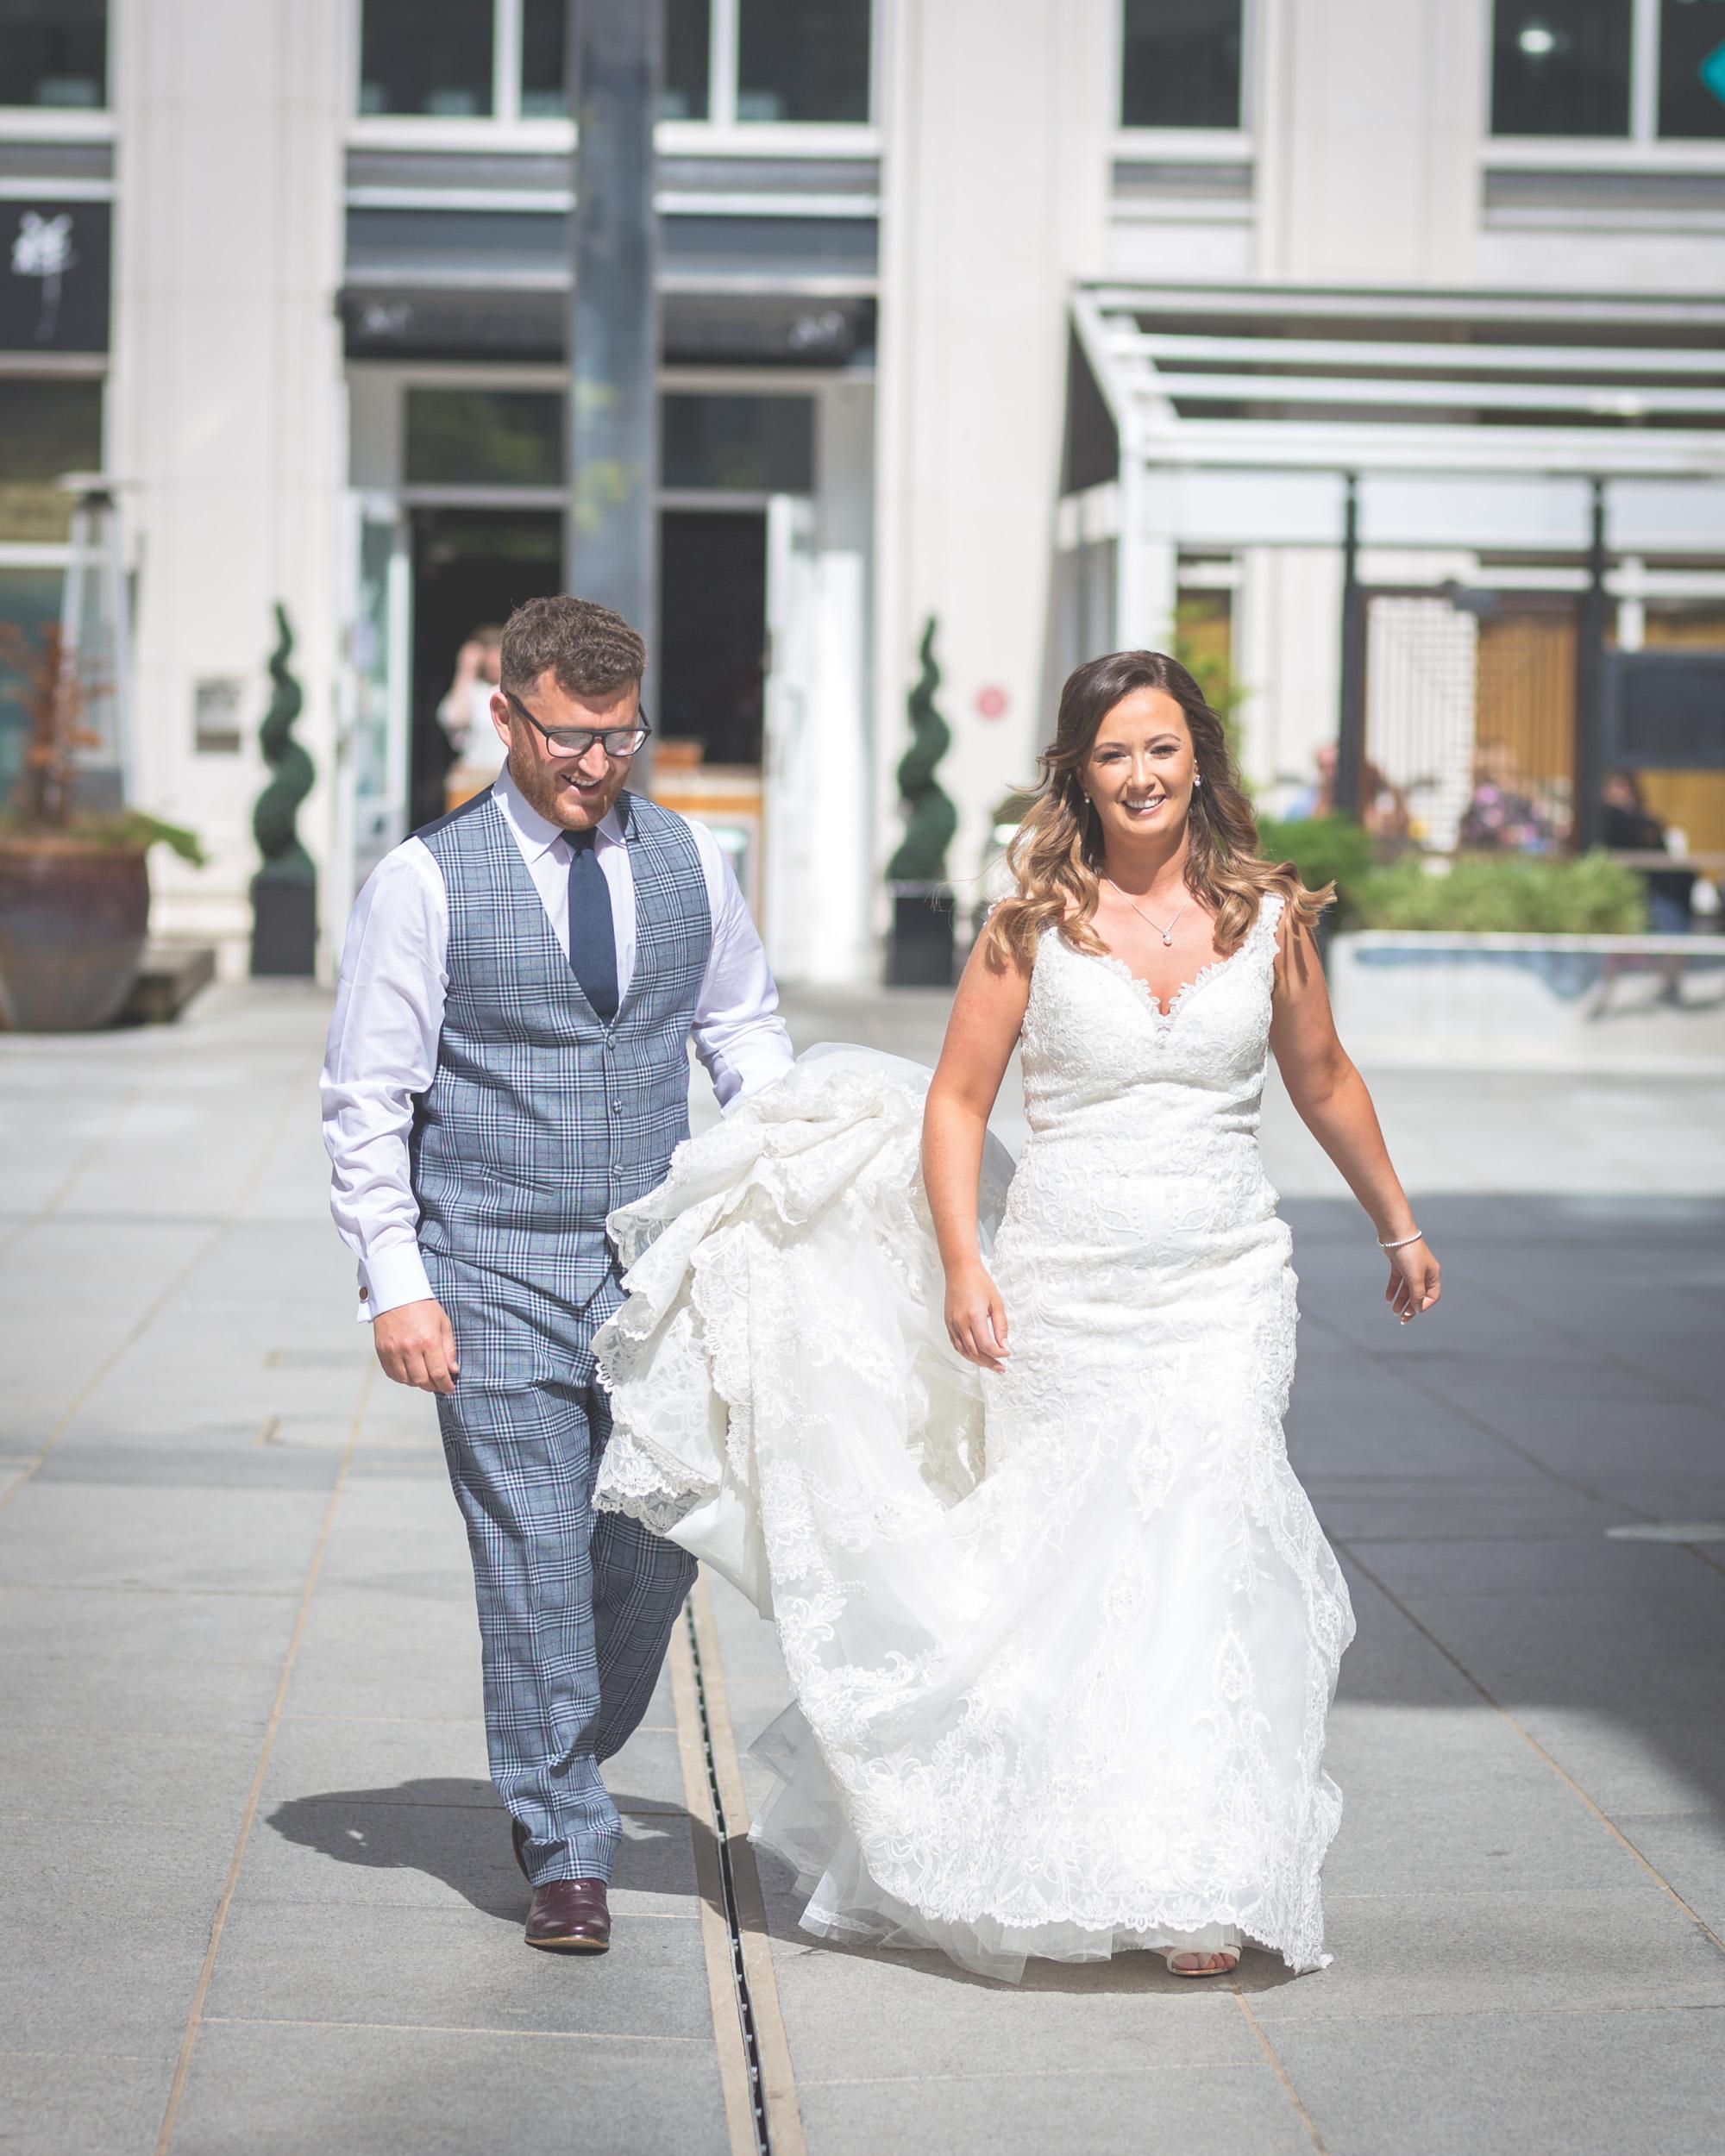 Brian McEwan   Northern Ireland Wedding Photographer   Rebecca & Michael   Portraits-103.jpg